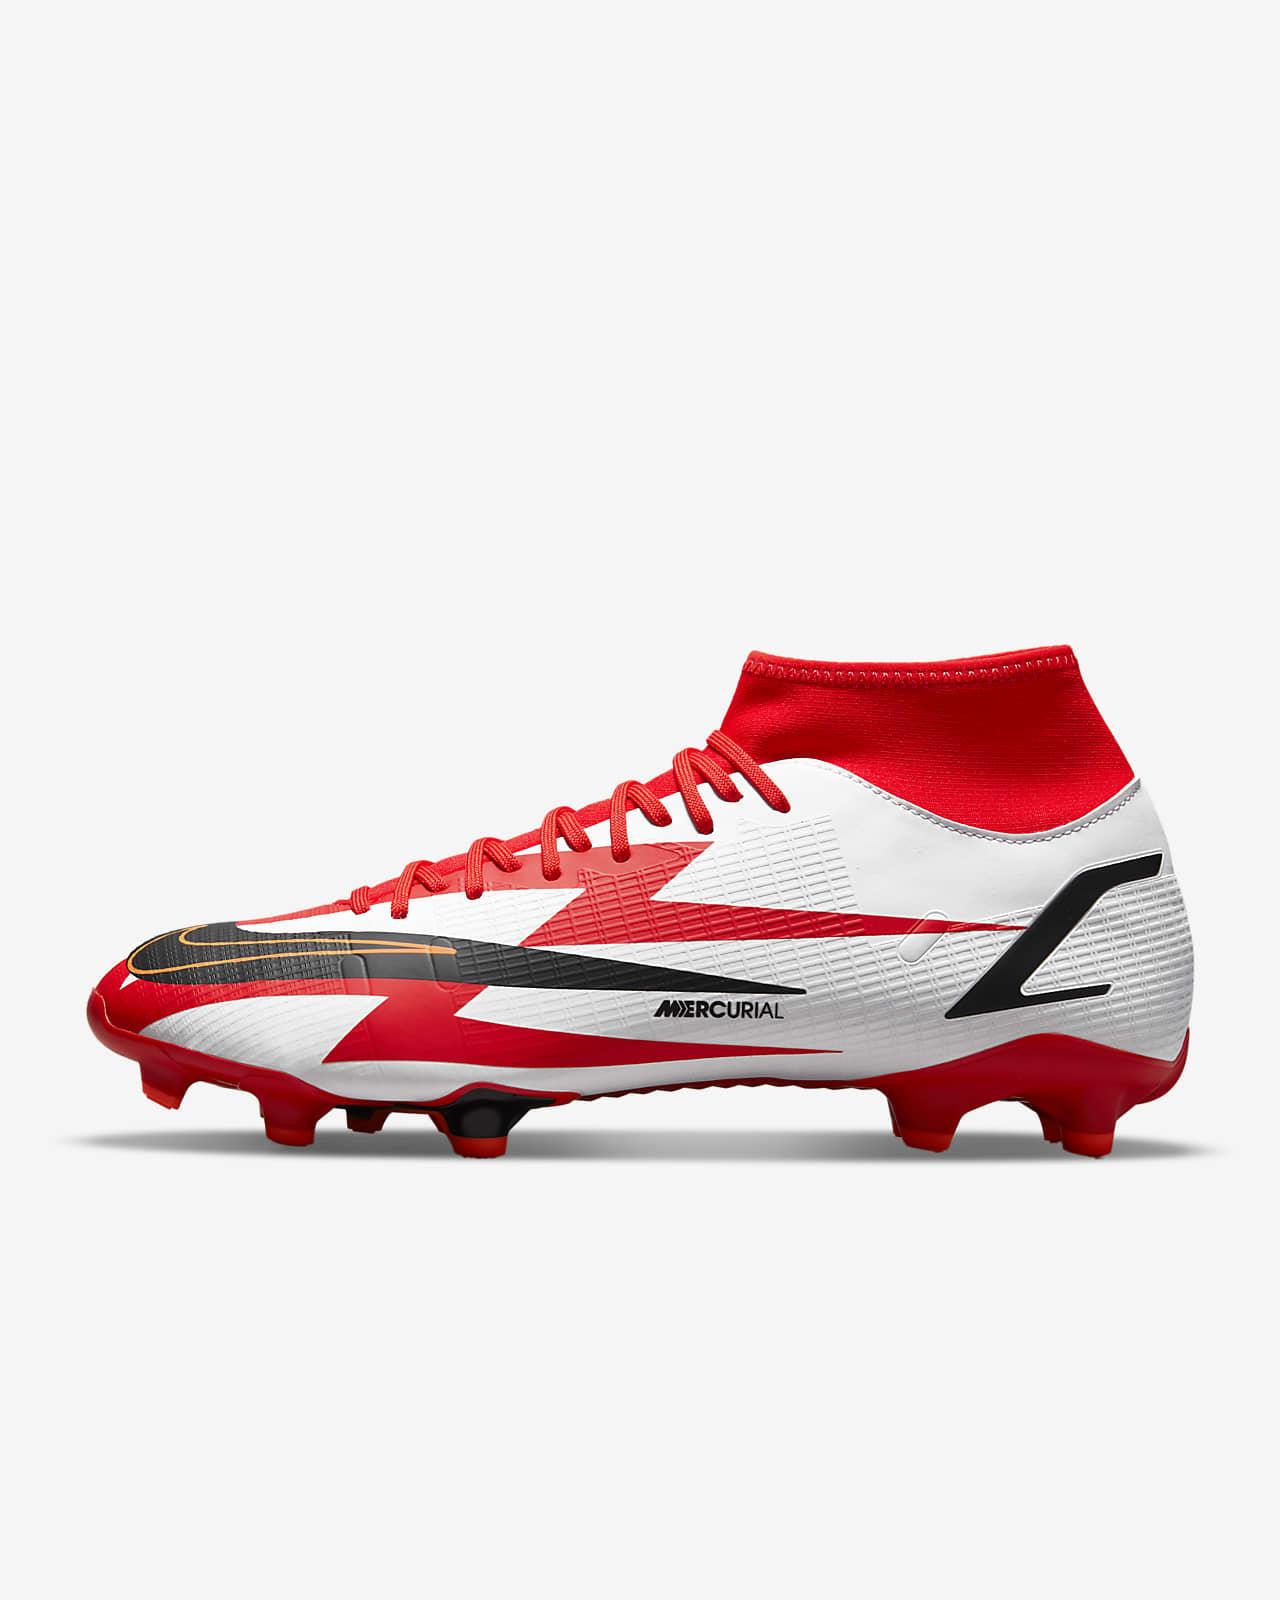 Scarpa da calcio multiterreno Nike Mercurial Superfly 8 Academy CR7 MG